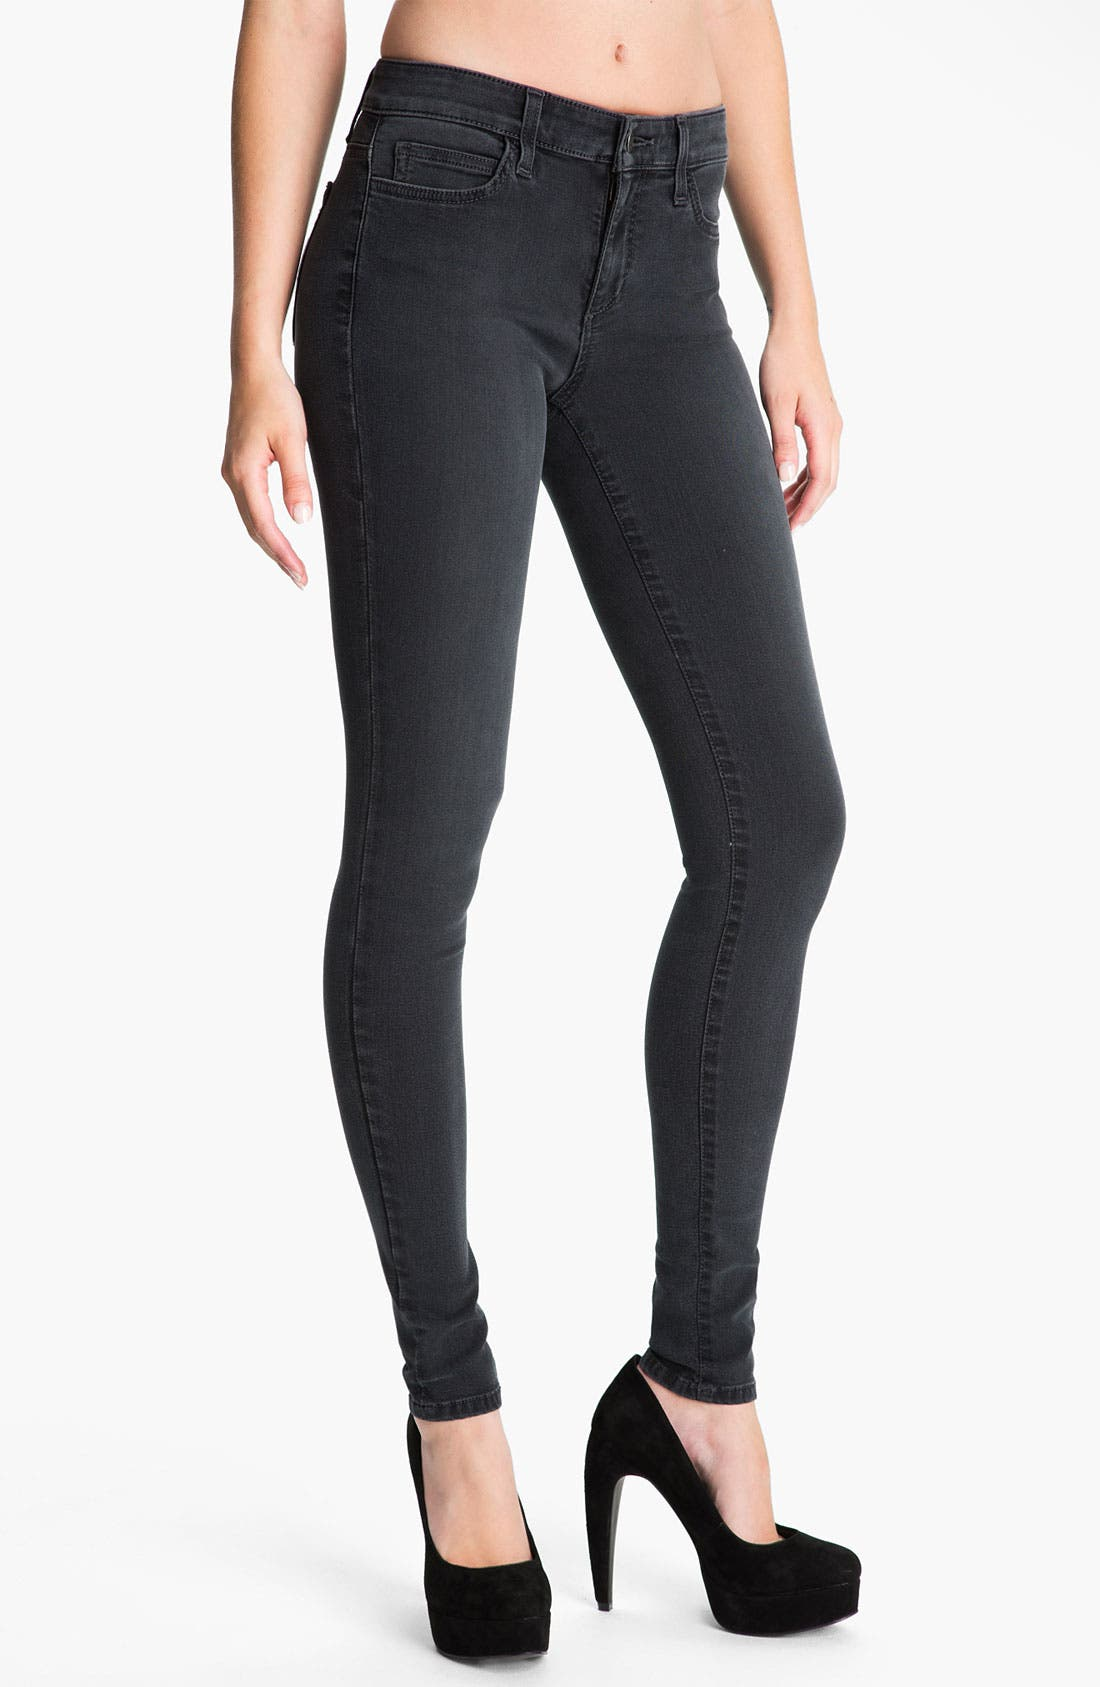 Main Image - Joe's Skinny Stretch Jeans (Black)